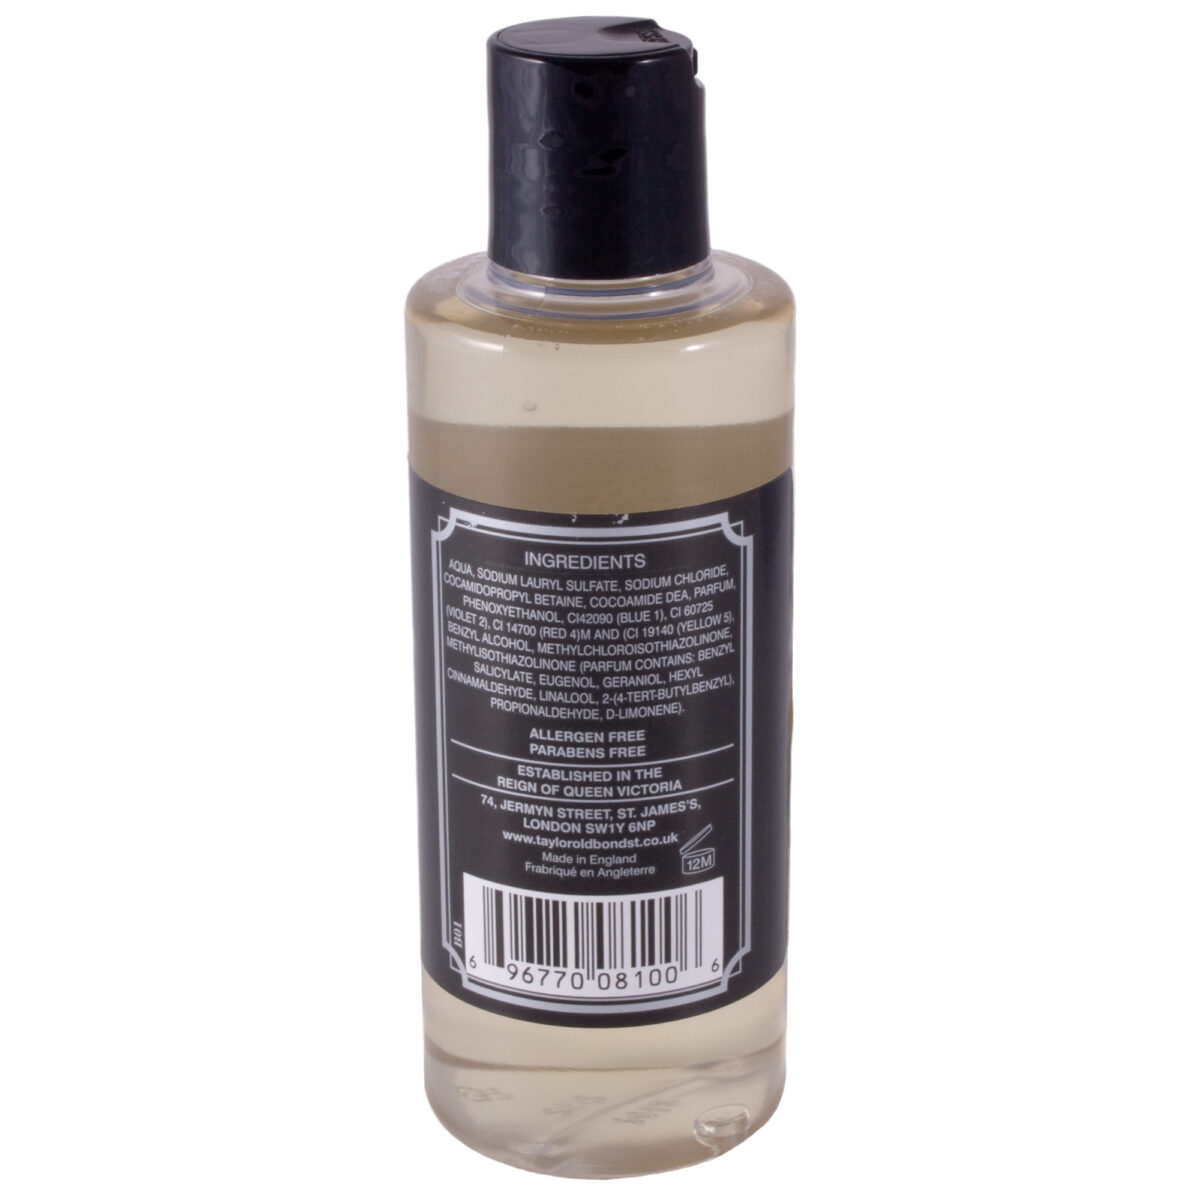 Taylor of Old Bond Street Jermyn Streeet Mens Hair and Body Shampoo 200ml-7416